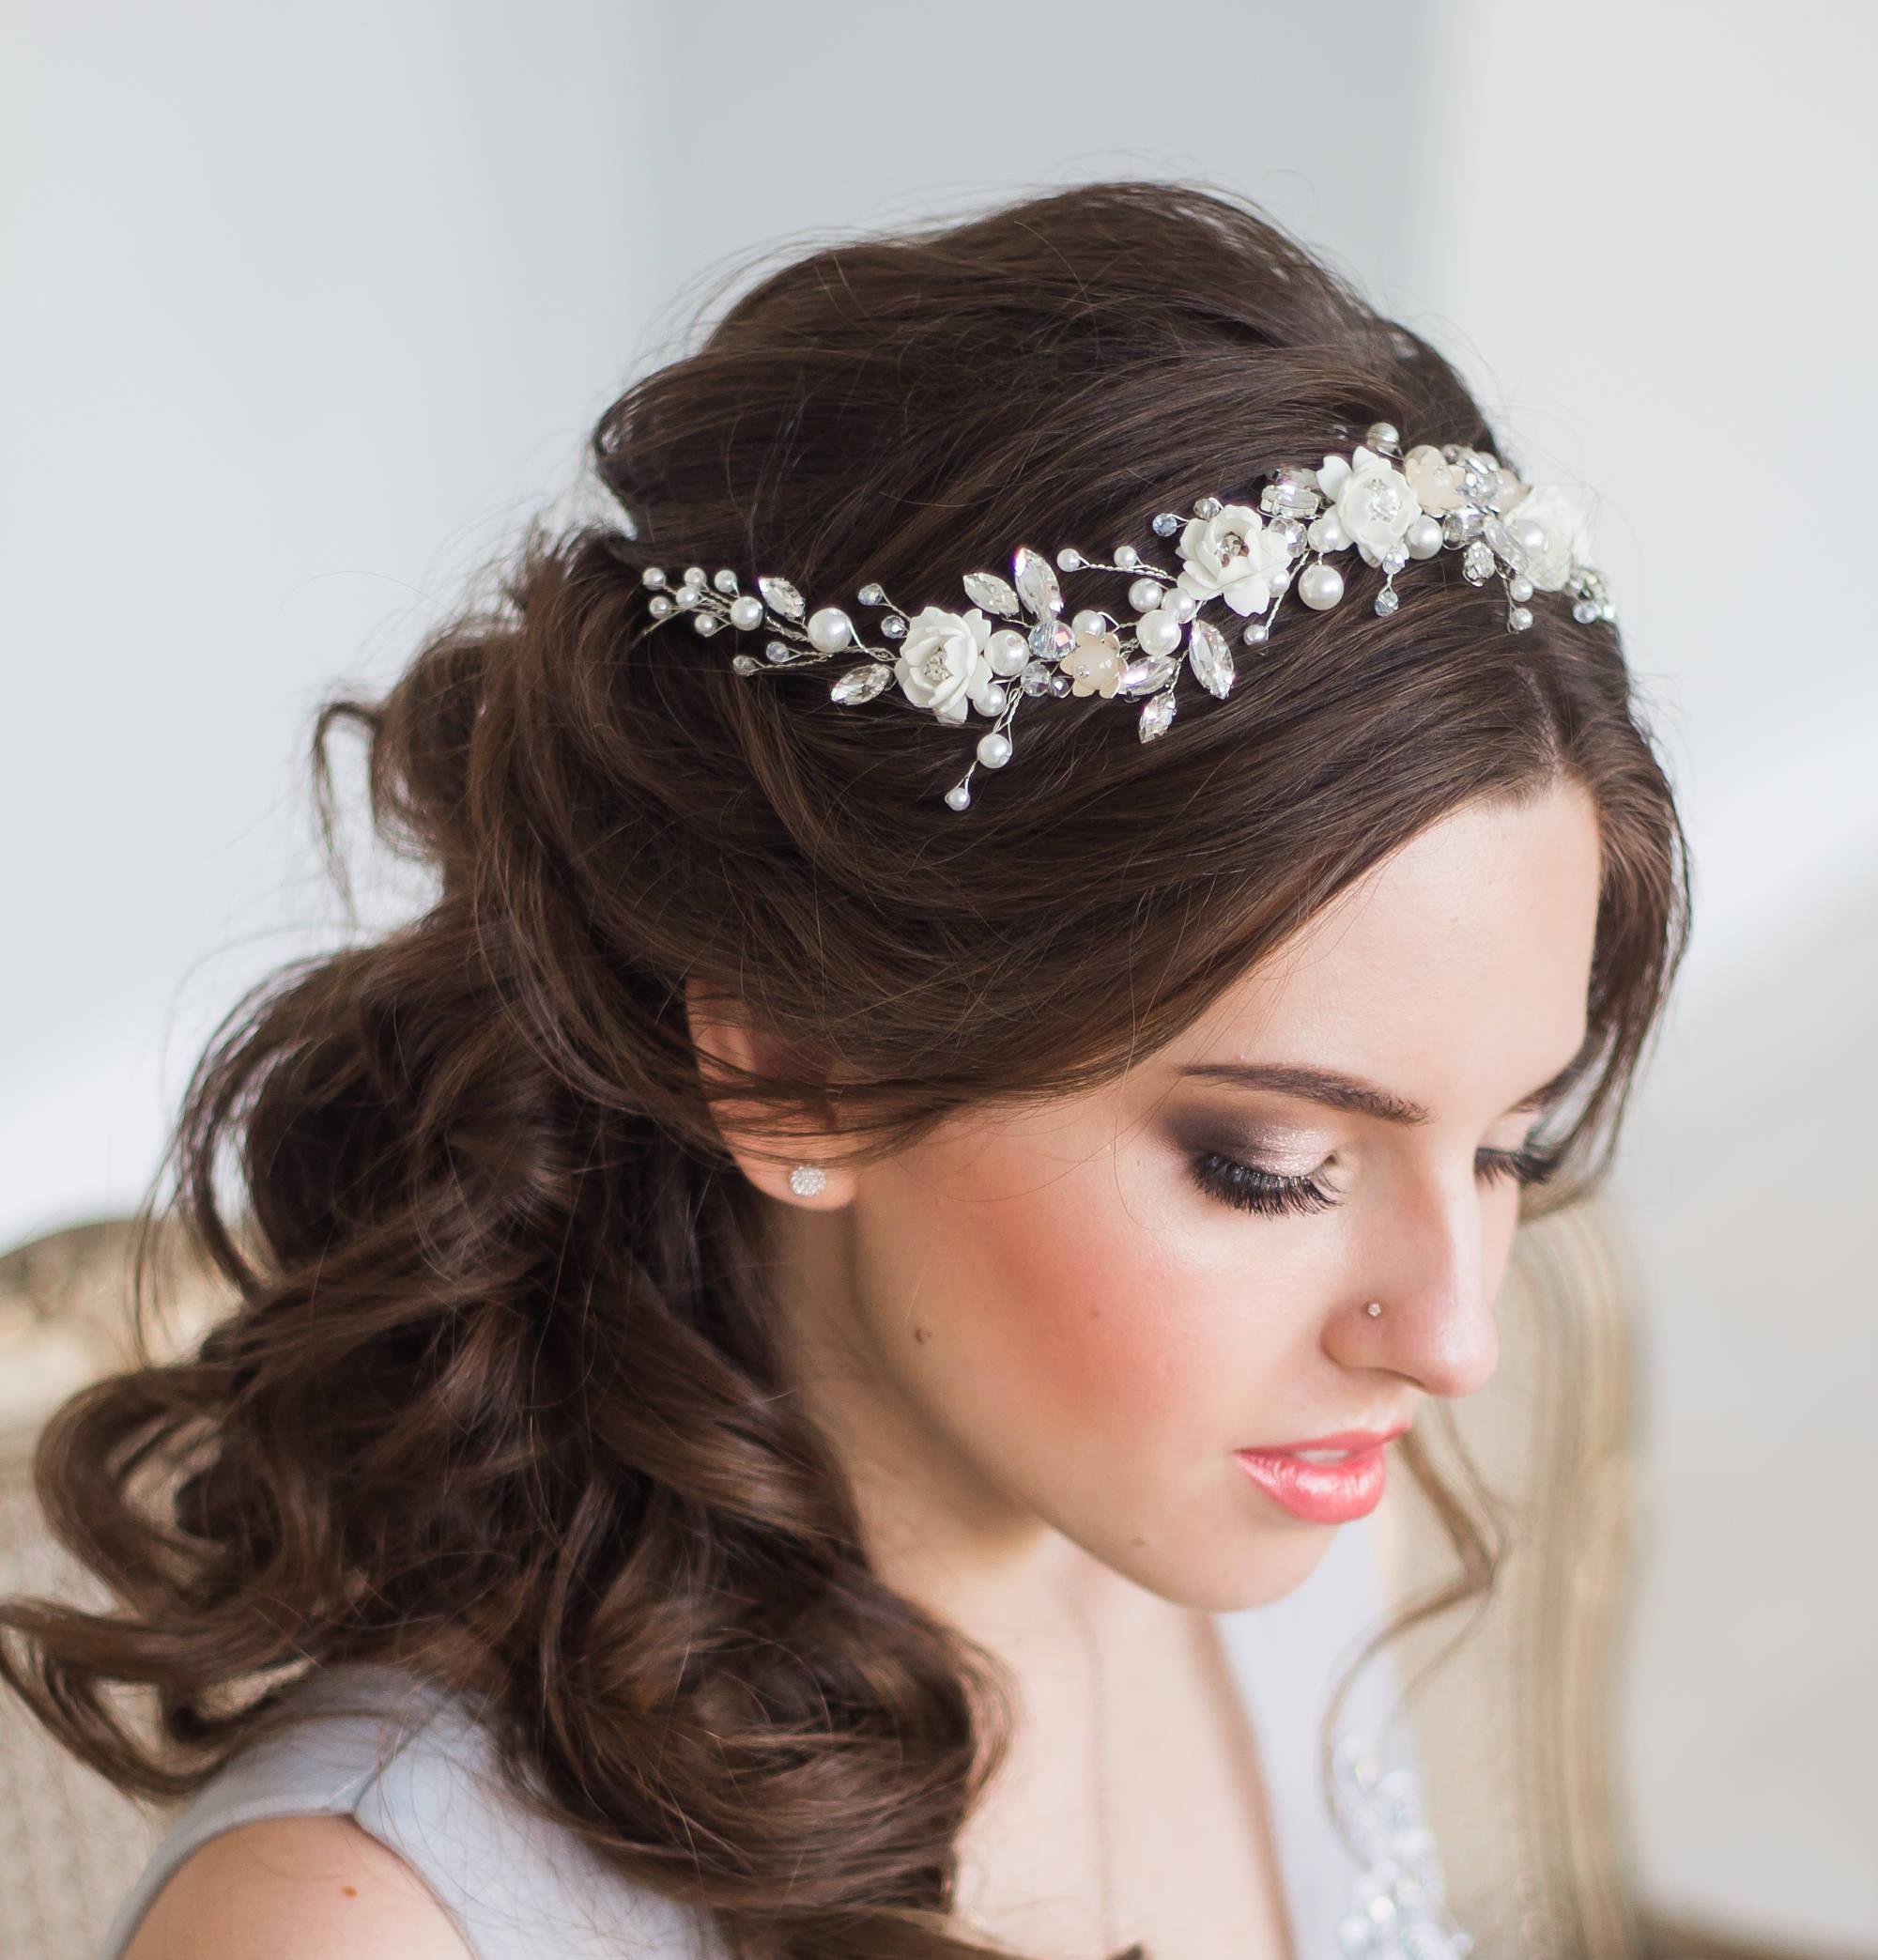 Hairstyles For Wedding Using A Crown: BLOOM Bridal Hair Vine Wedding Tiara Diadem Pearl Hair